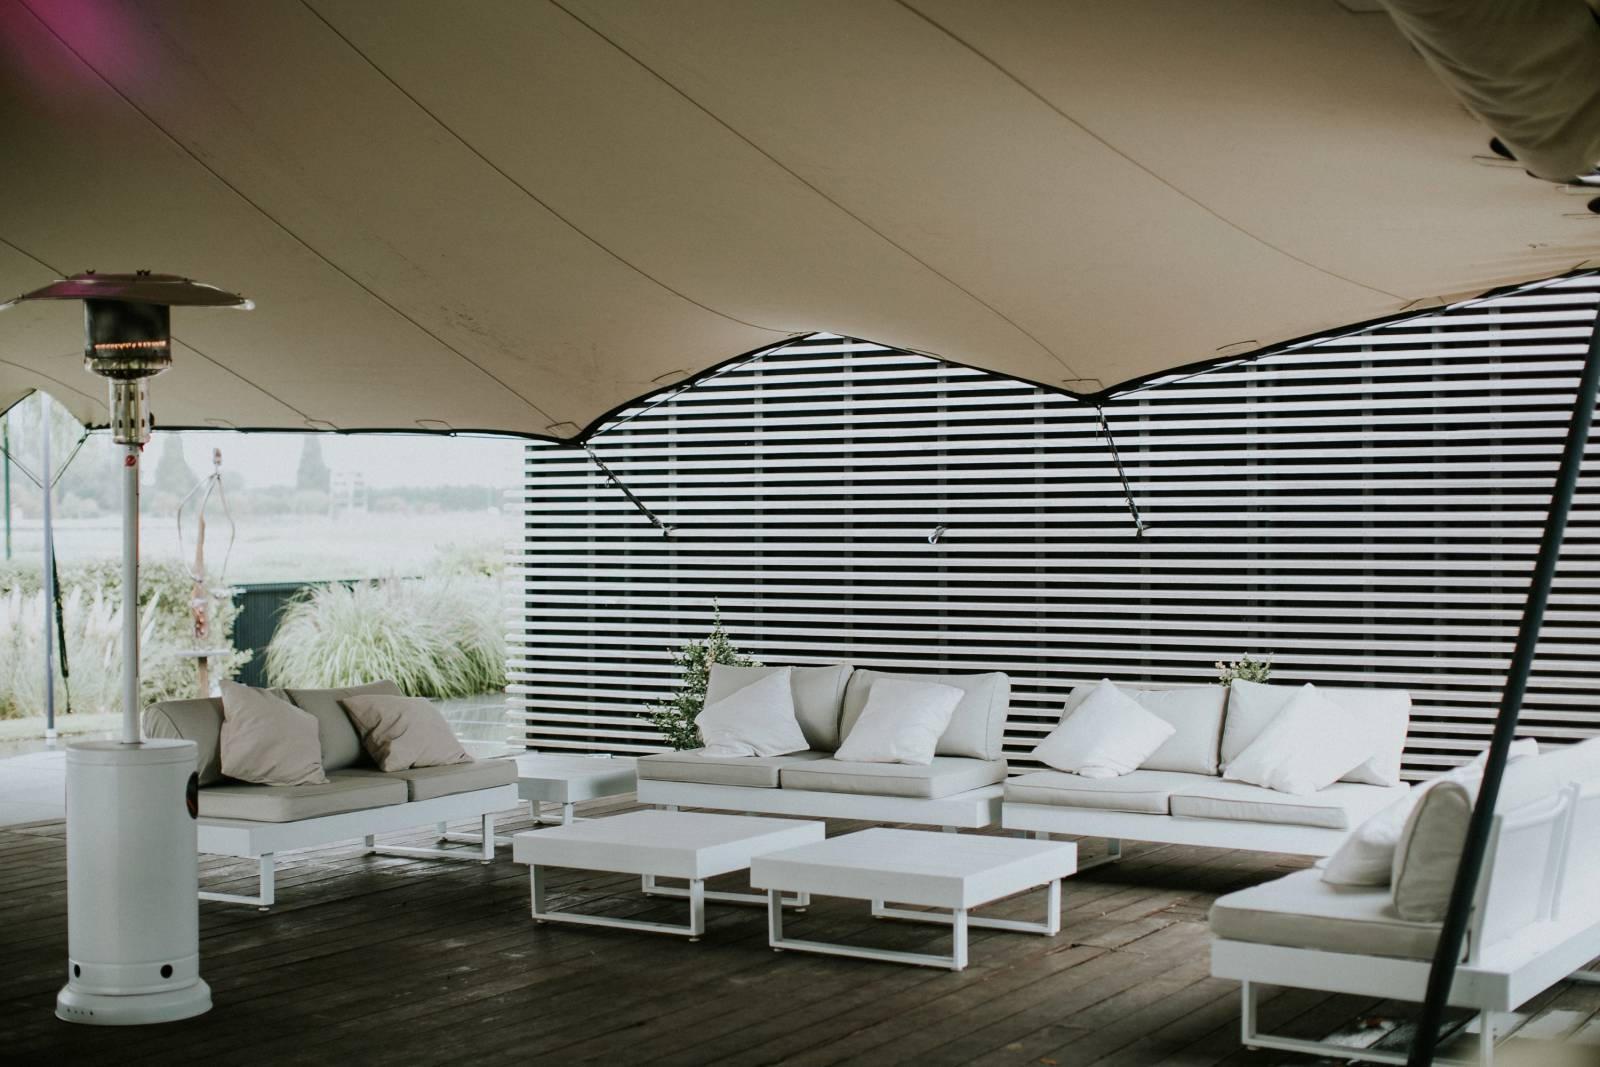 Nuptiae Fairytale Architects - Wedding Planner -  House of Weddings - 67